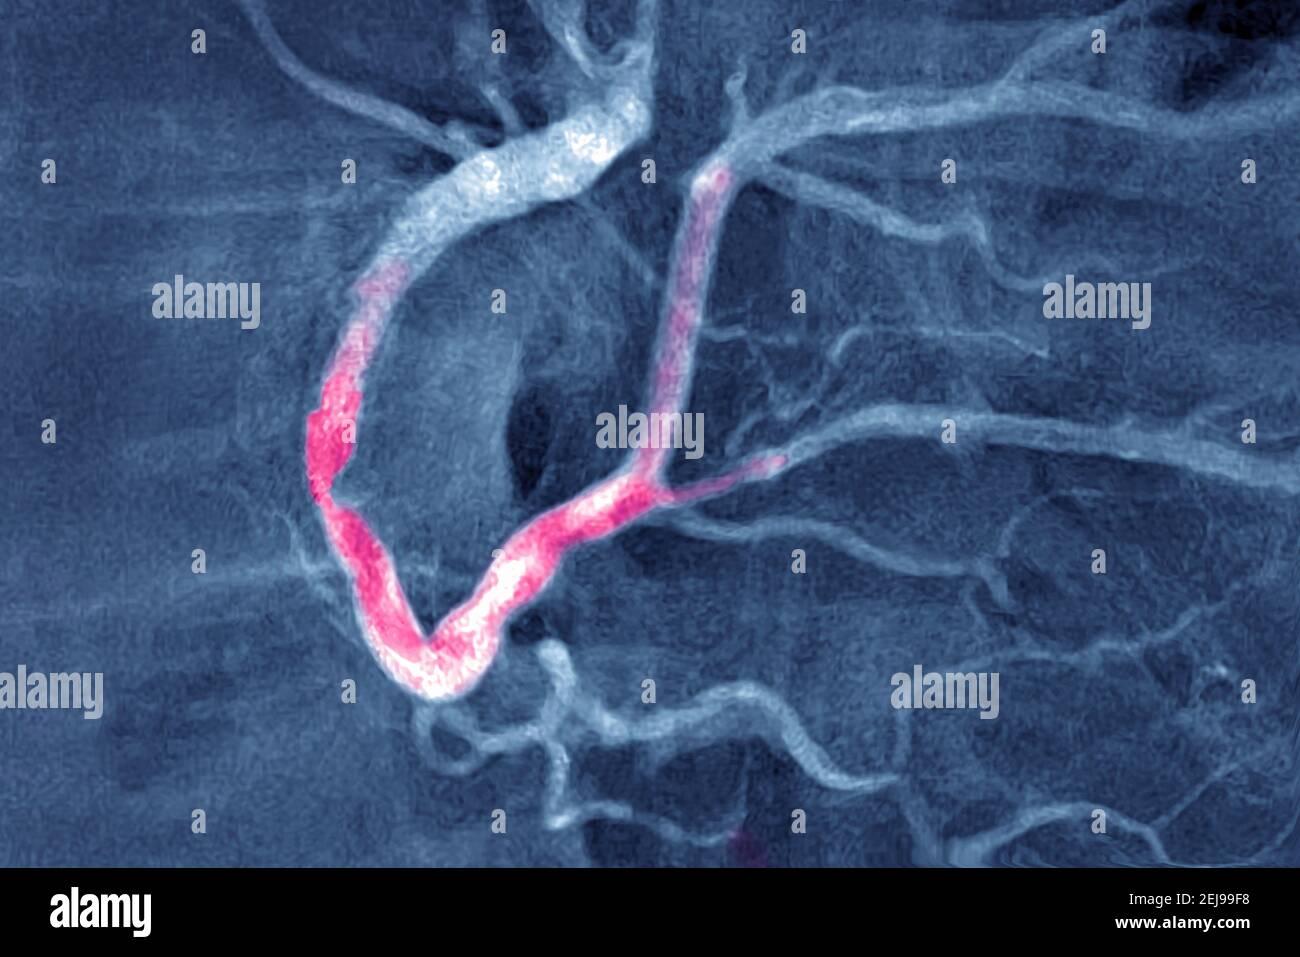 Infarctus du myocarde avec un thrombus significatif Banque D'Images